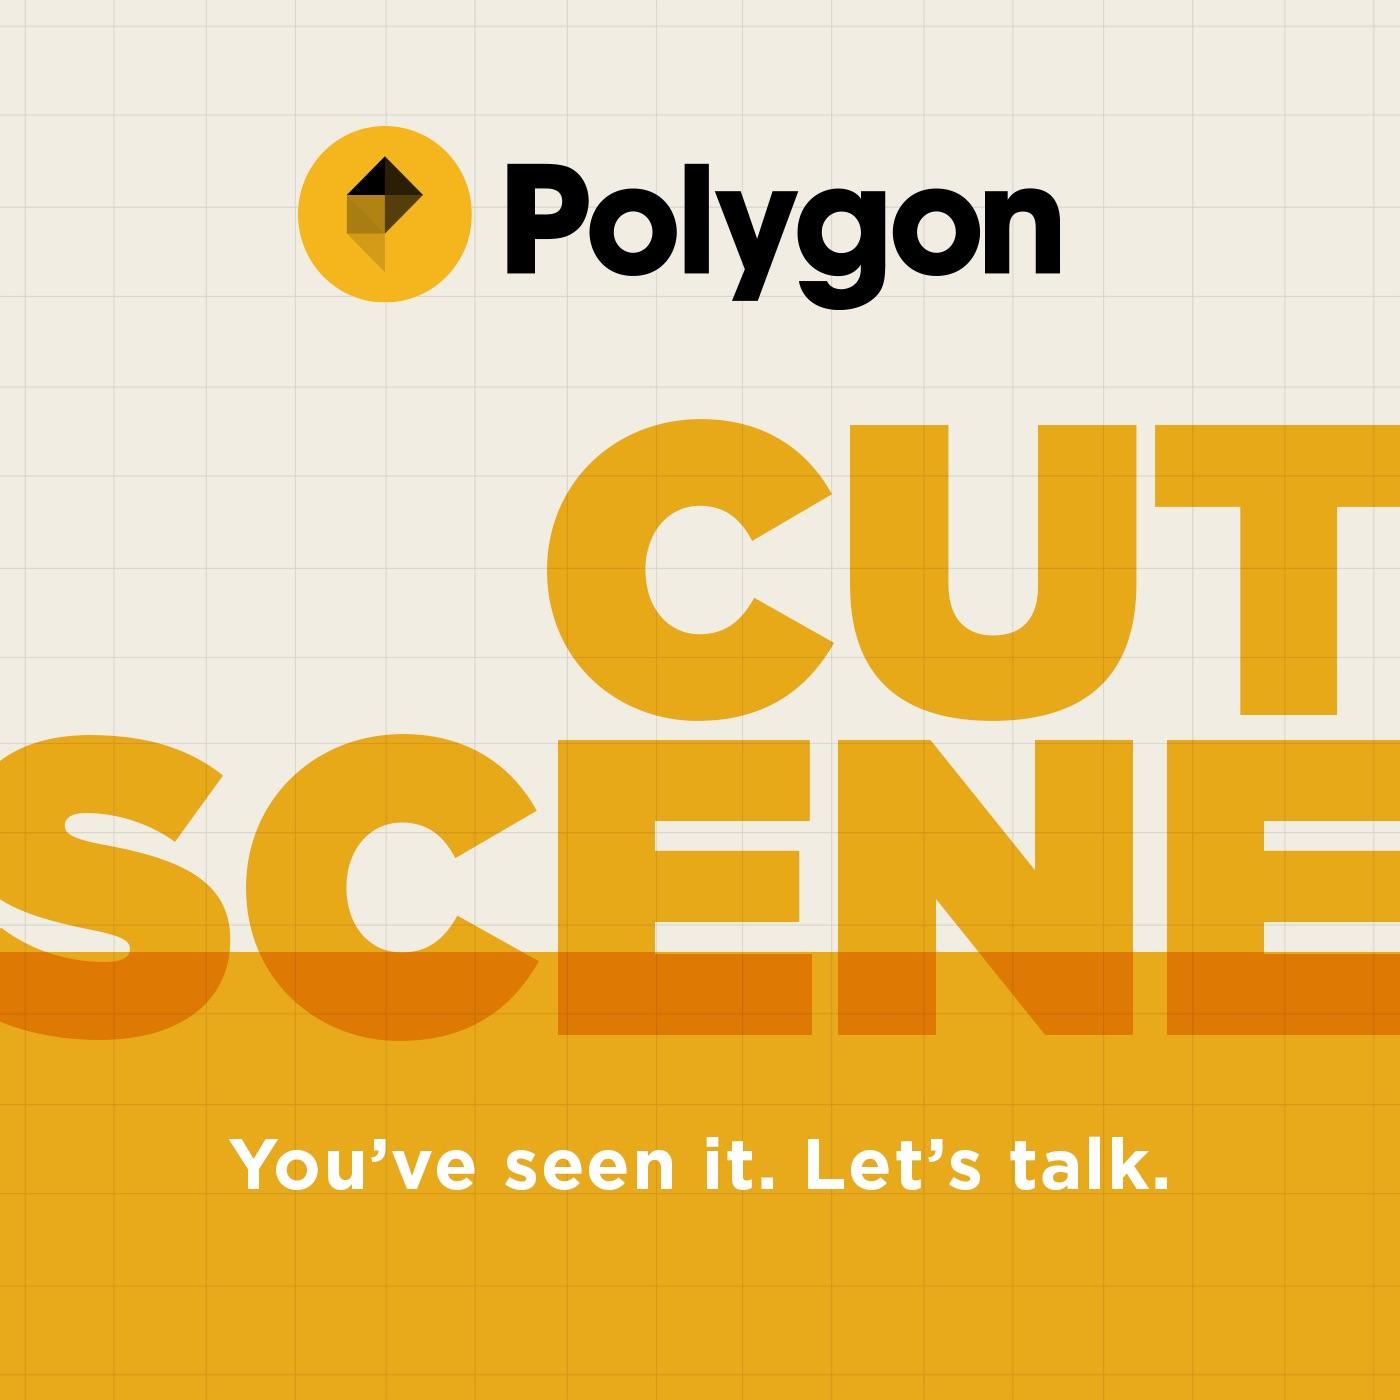 Polygon Cutscene